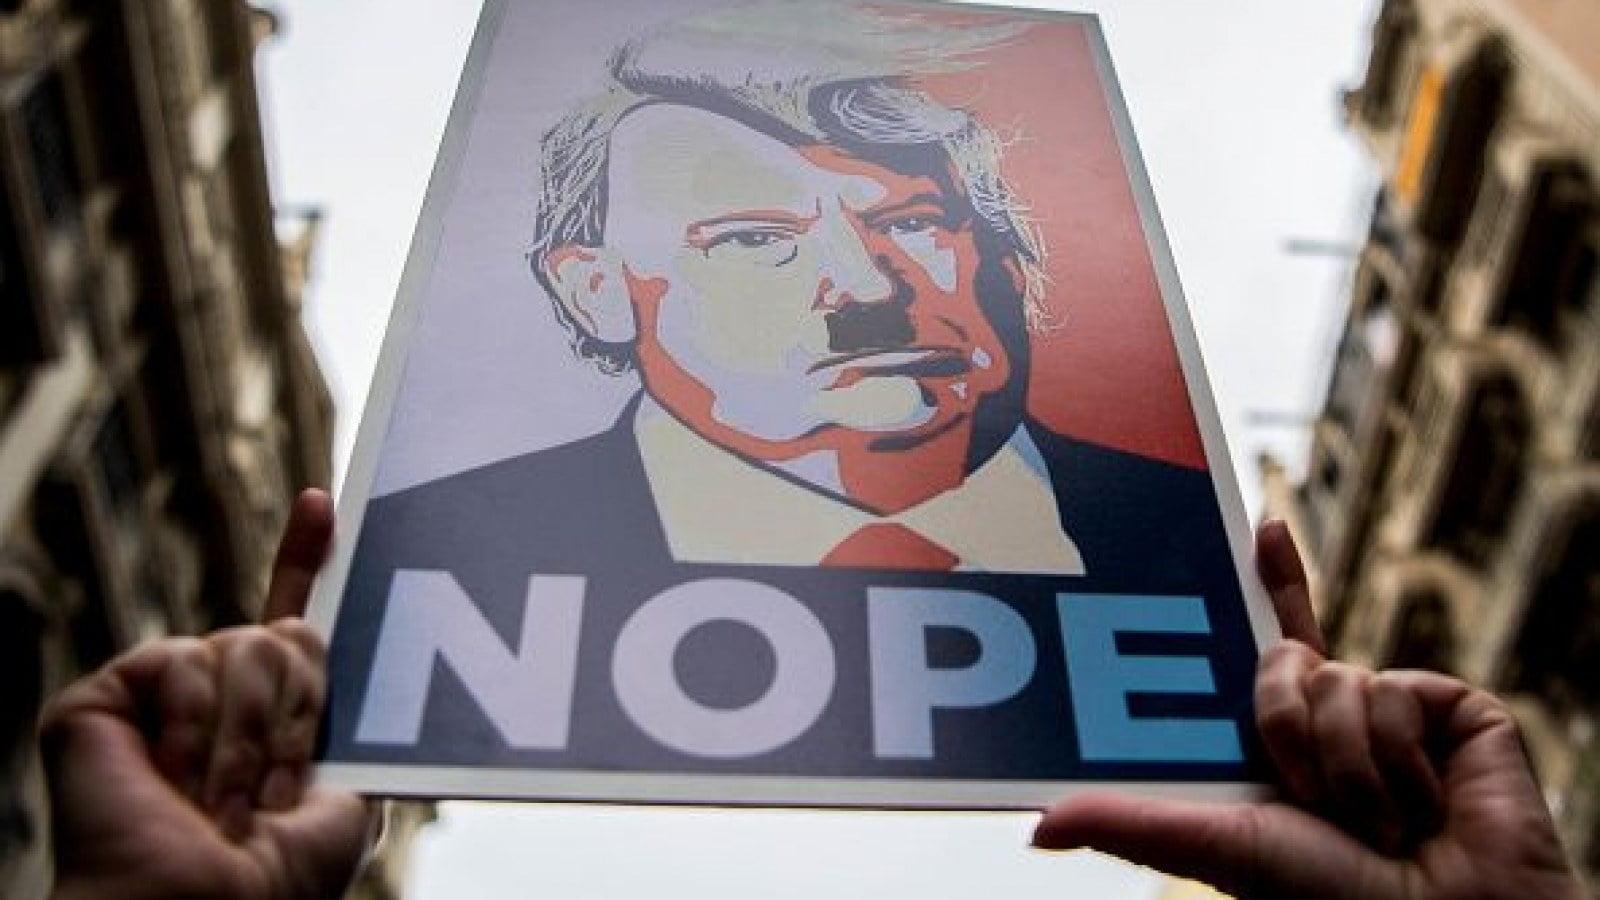 Trump placard